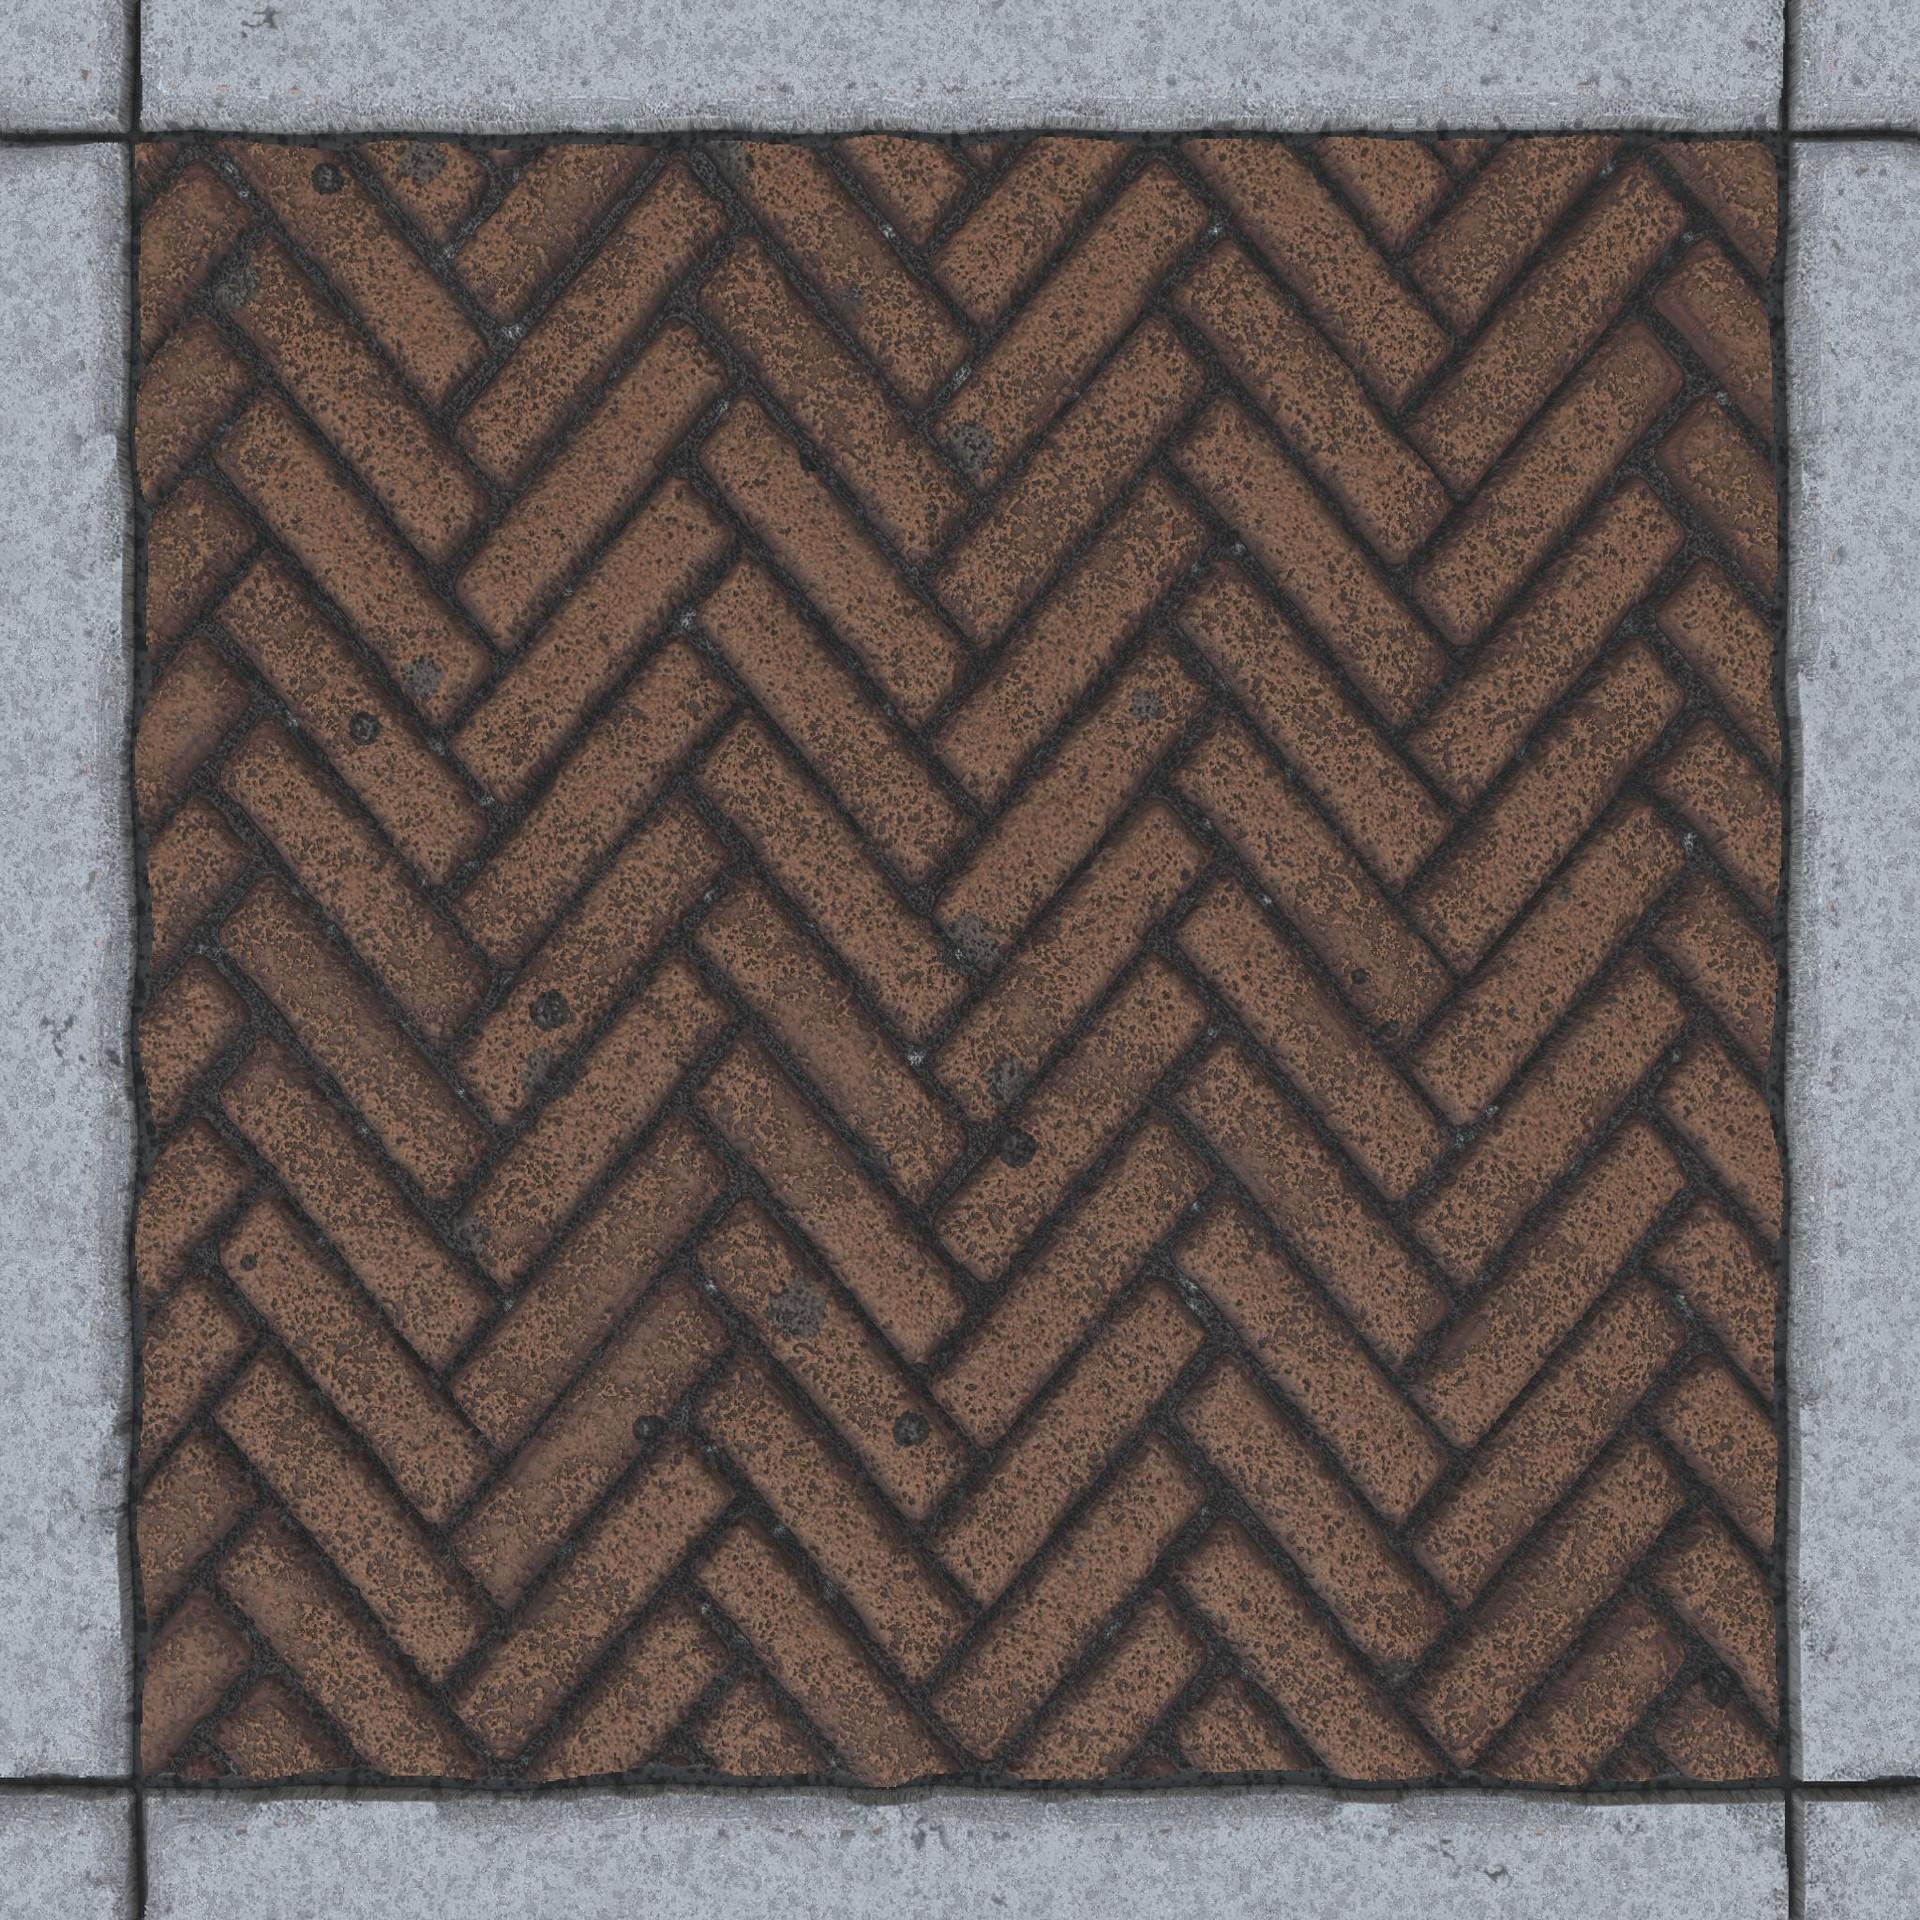 James ray sidewalk 2